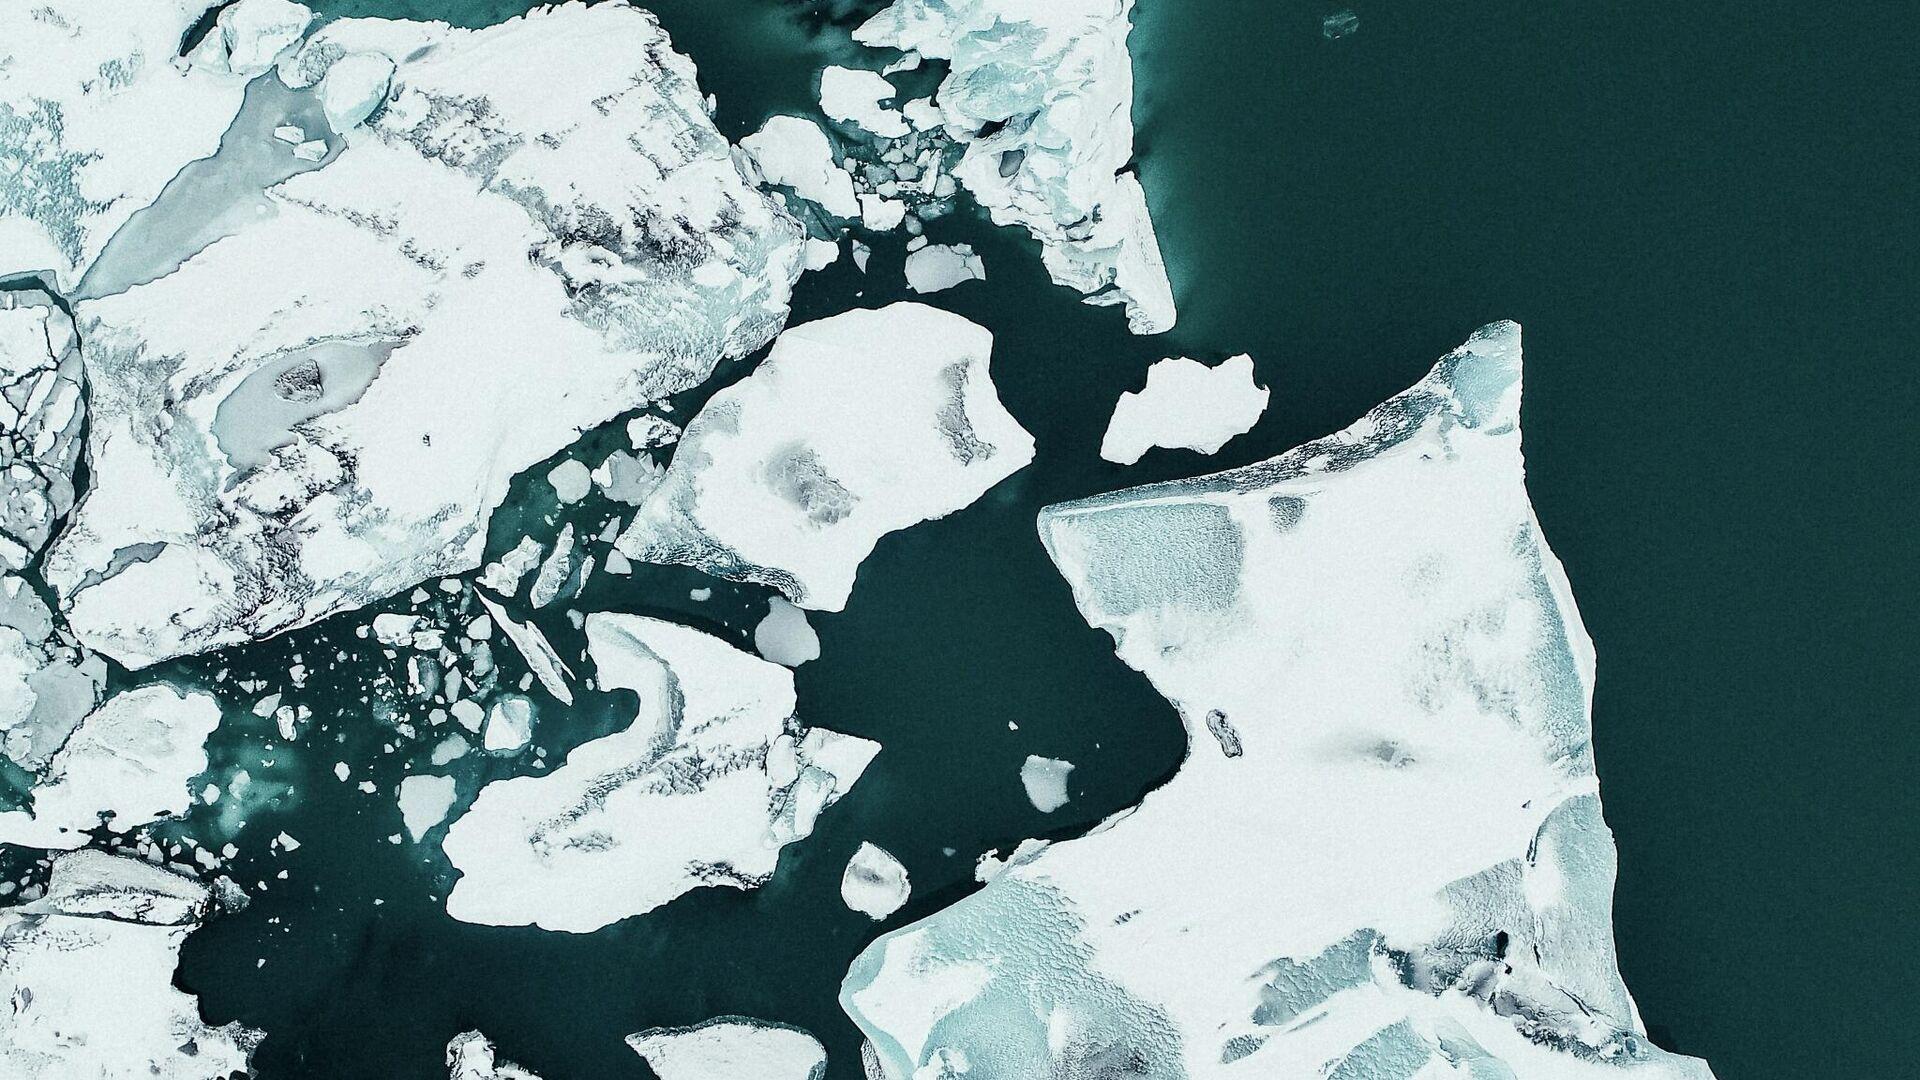 Un glaciar (imagen referencial) - Sputnik Mundo, 1920, 21.07.2021